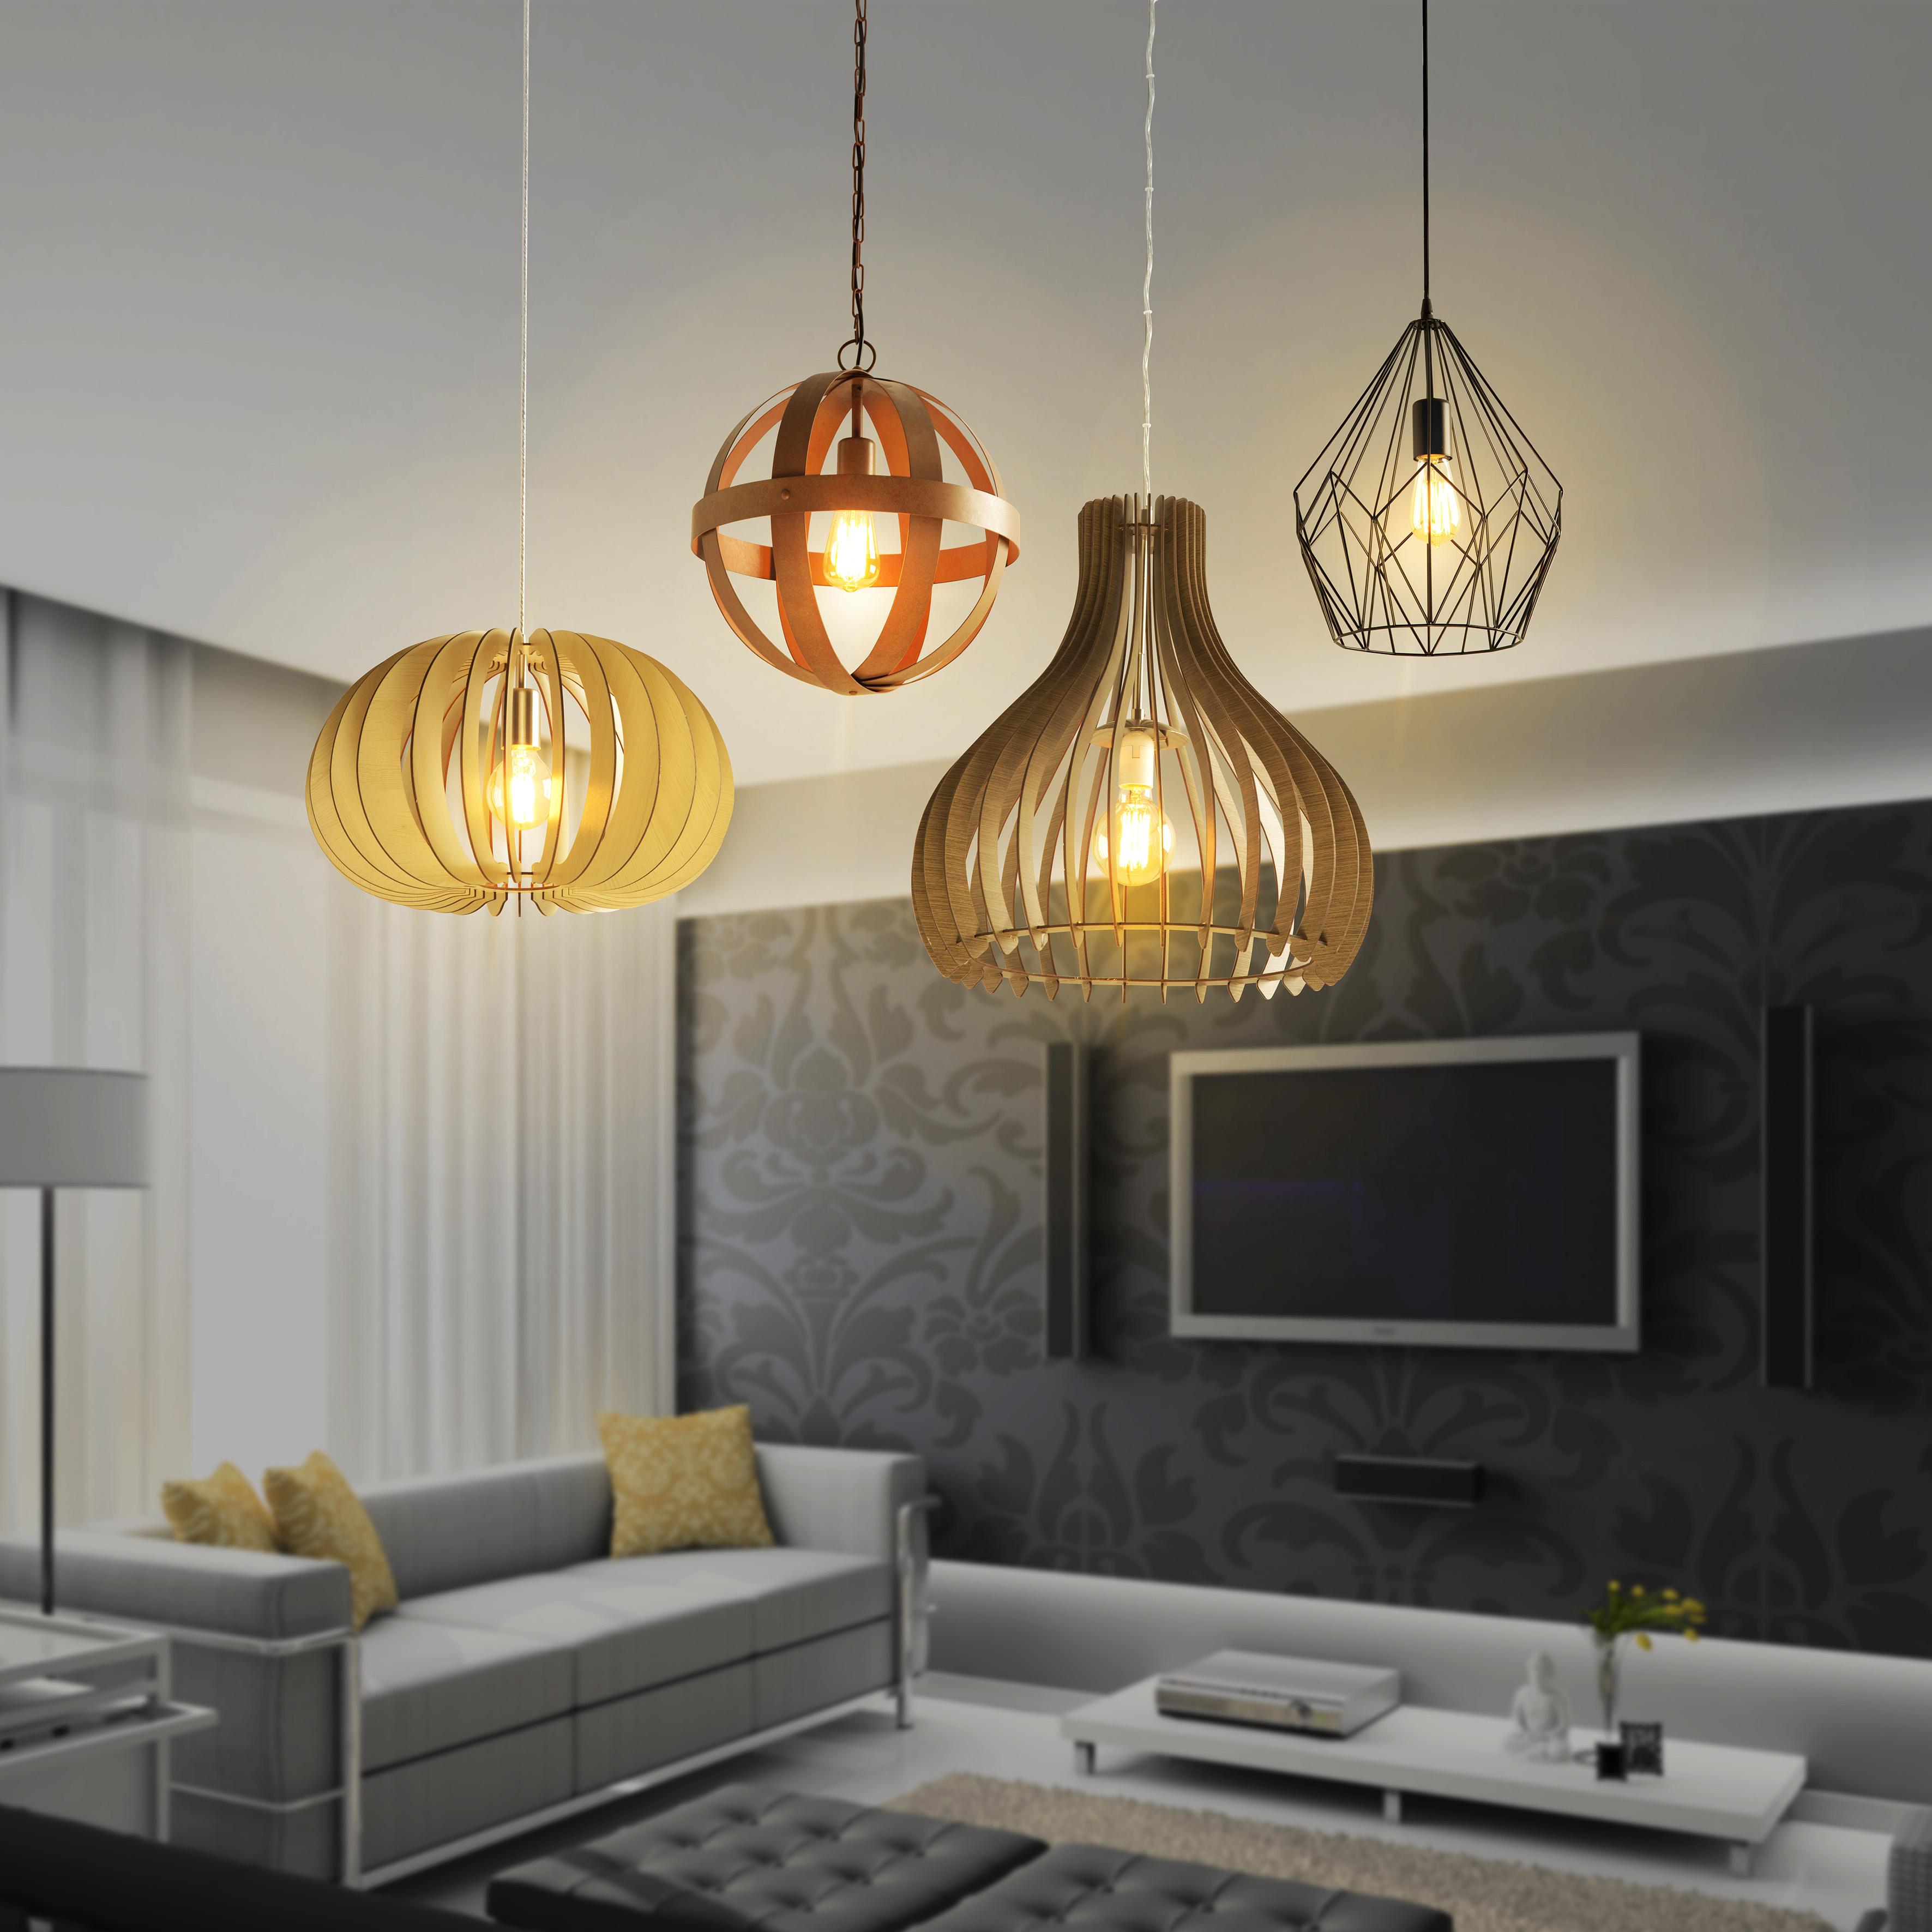 Catalogo de iluminacion the home depot 1 curso de organizacion del hogar y decoracion de - Catalogo de iluminacion interior ...